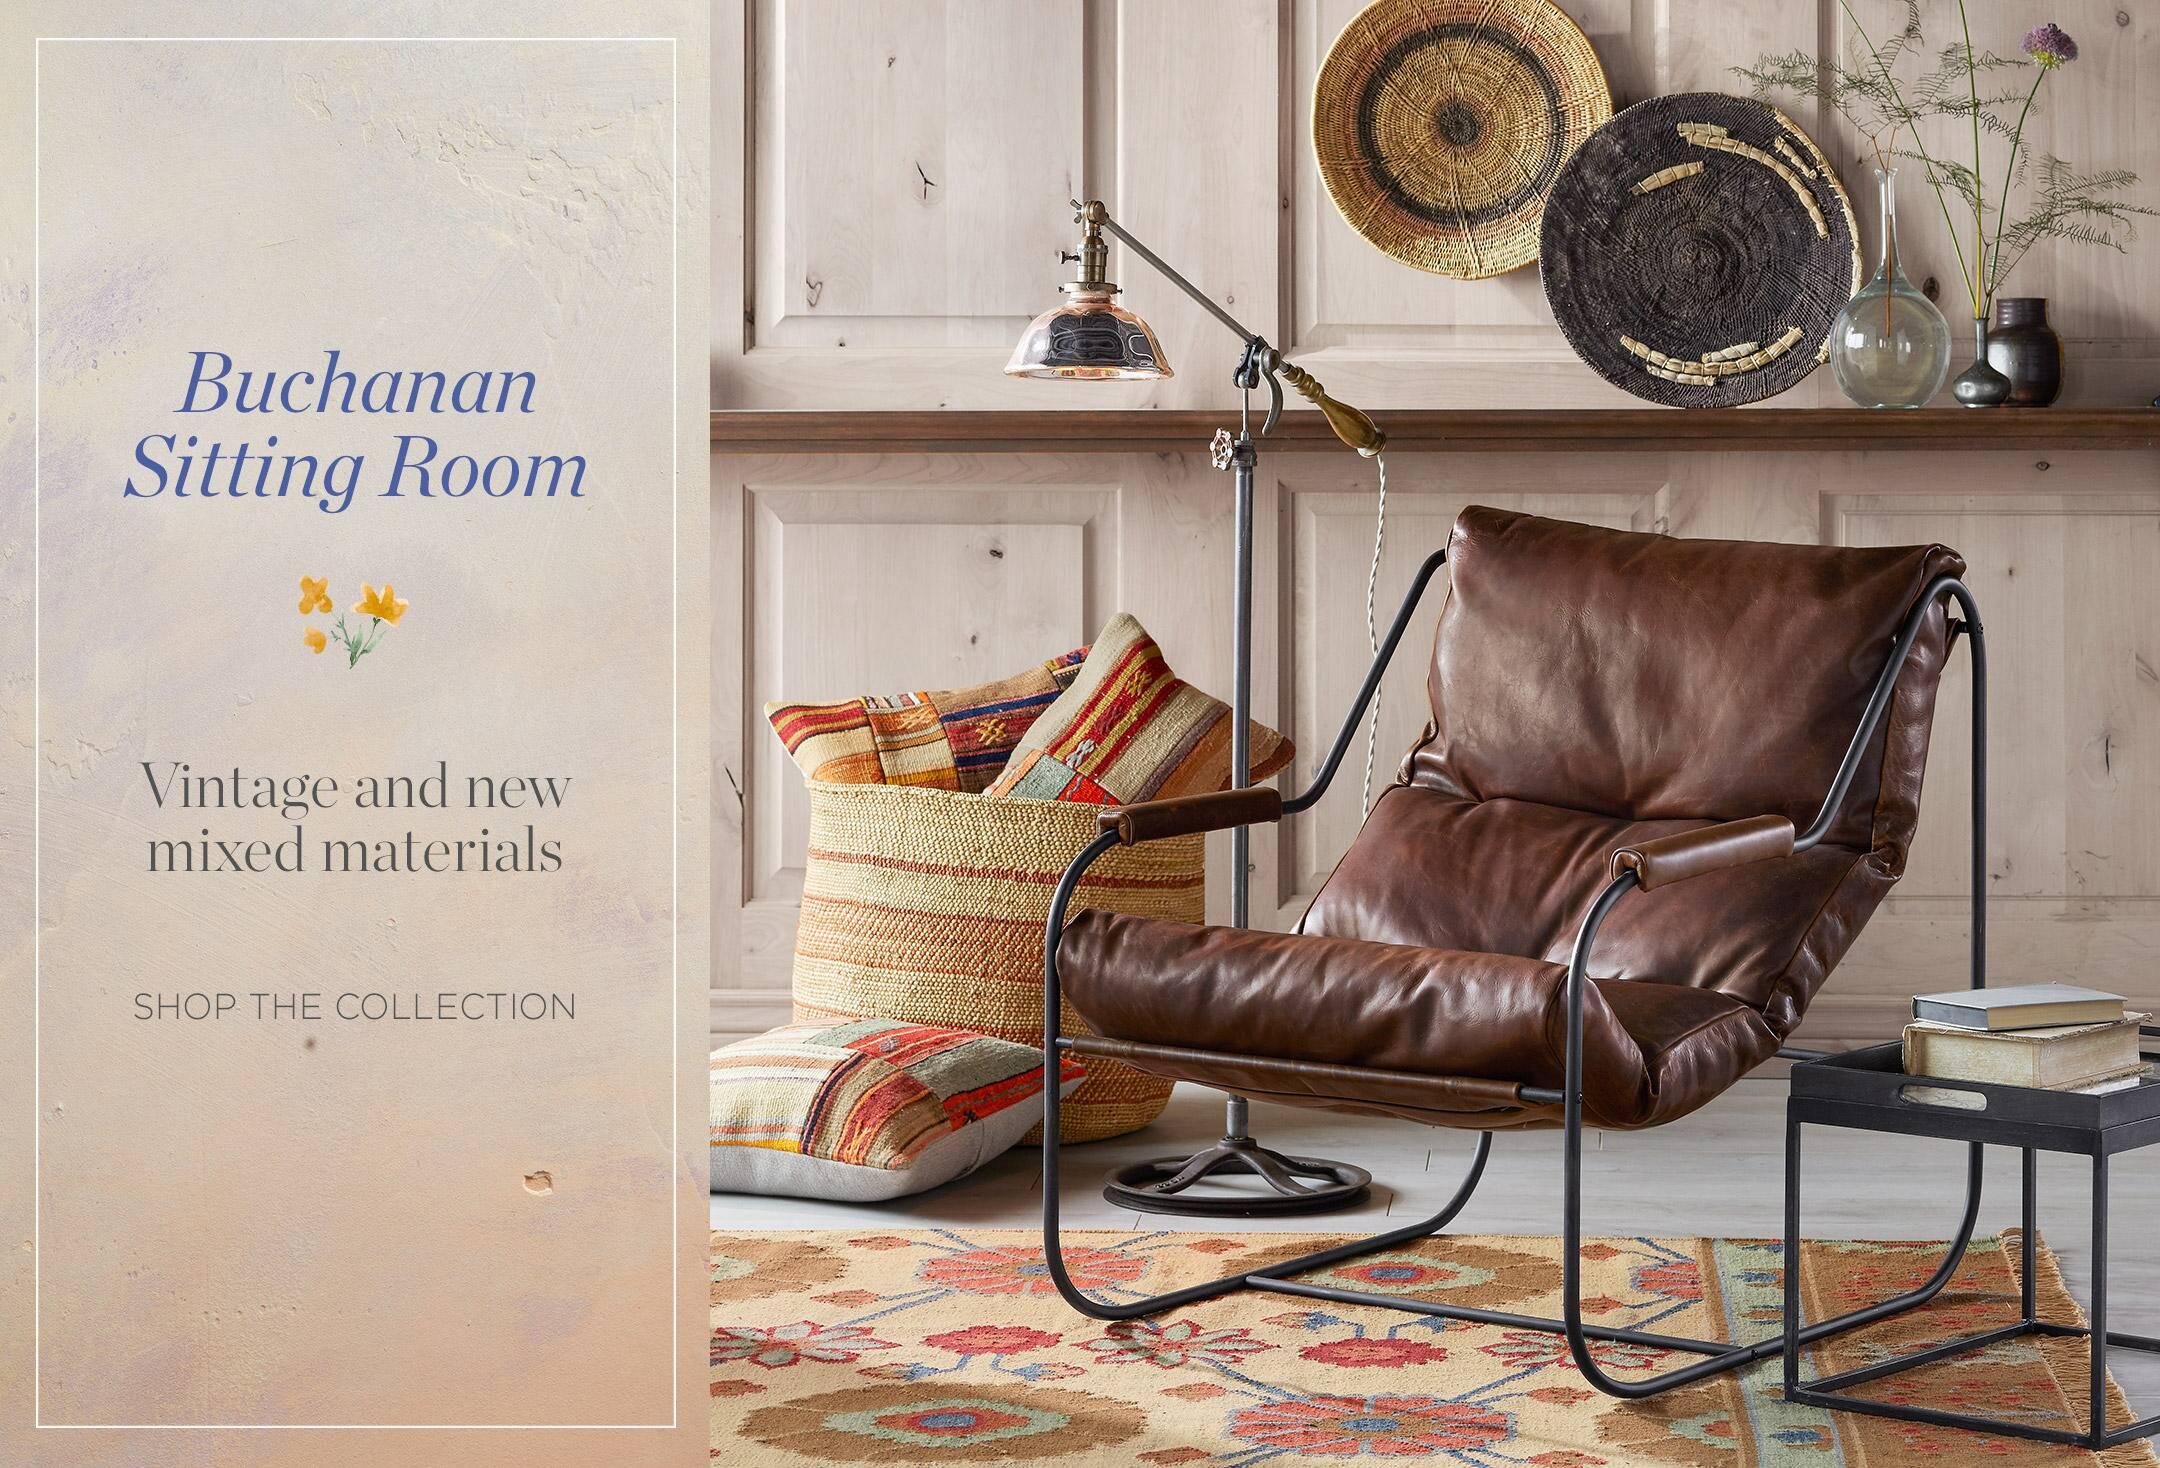 Buchanan Sitting Room